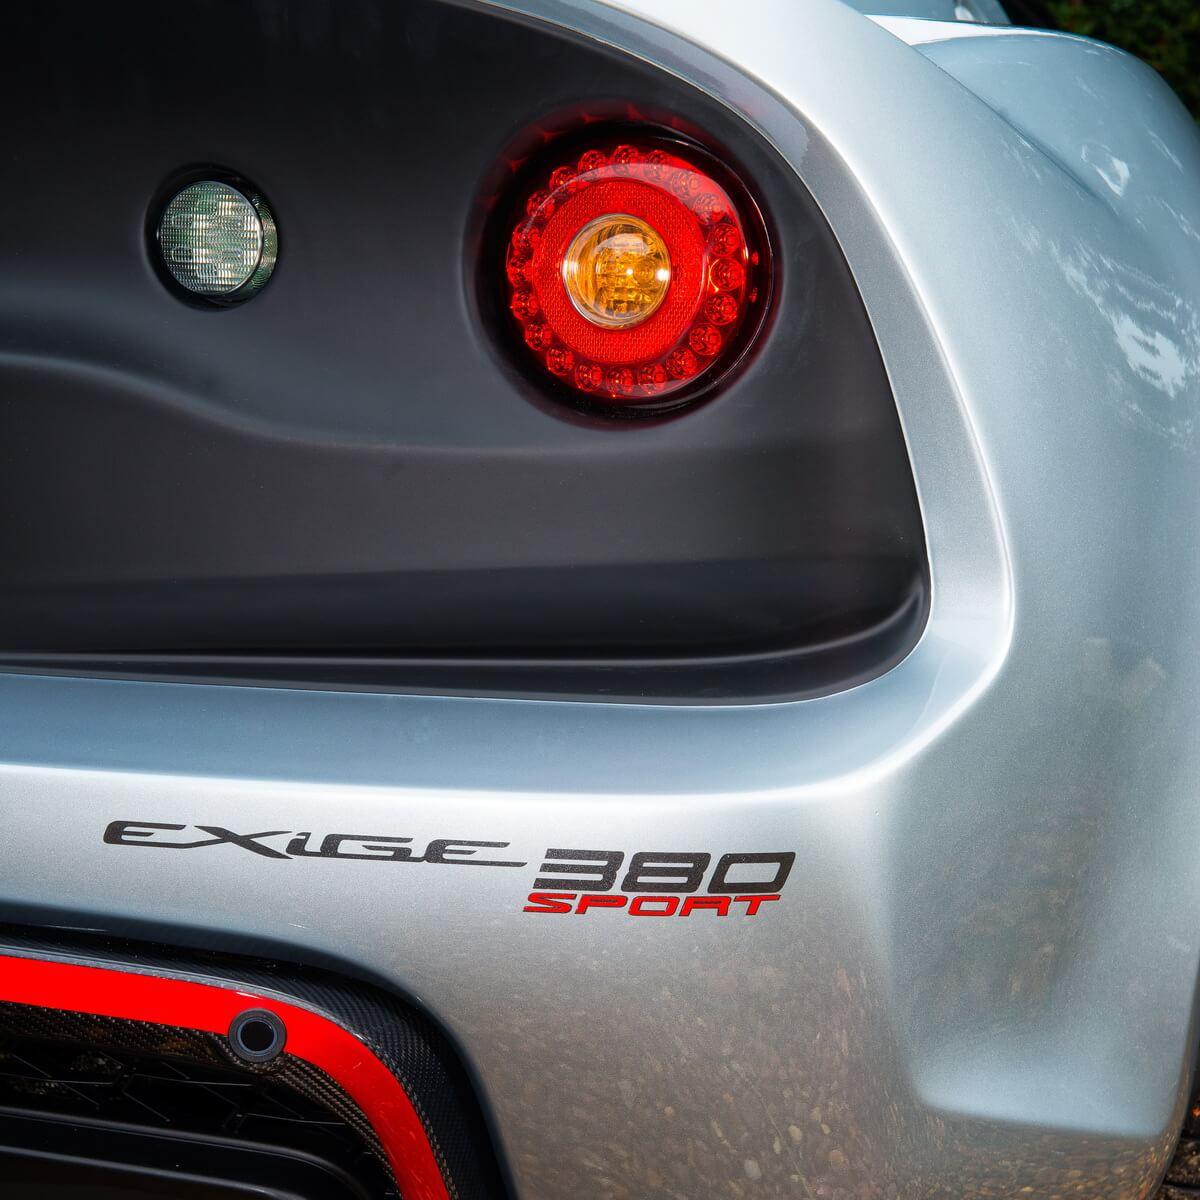 Lotus Exige Sport 380 logo arrière